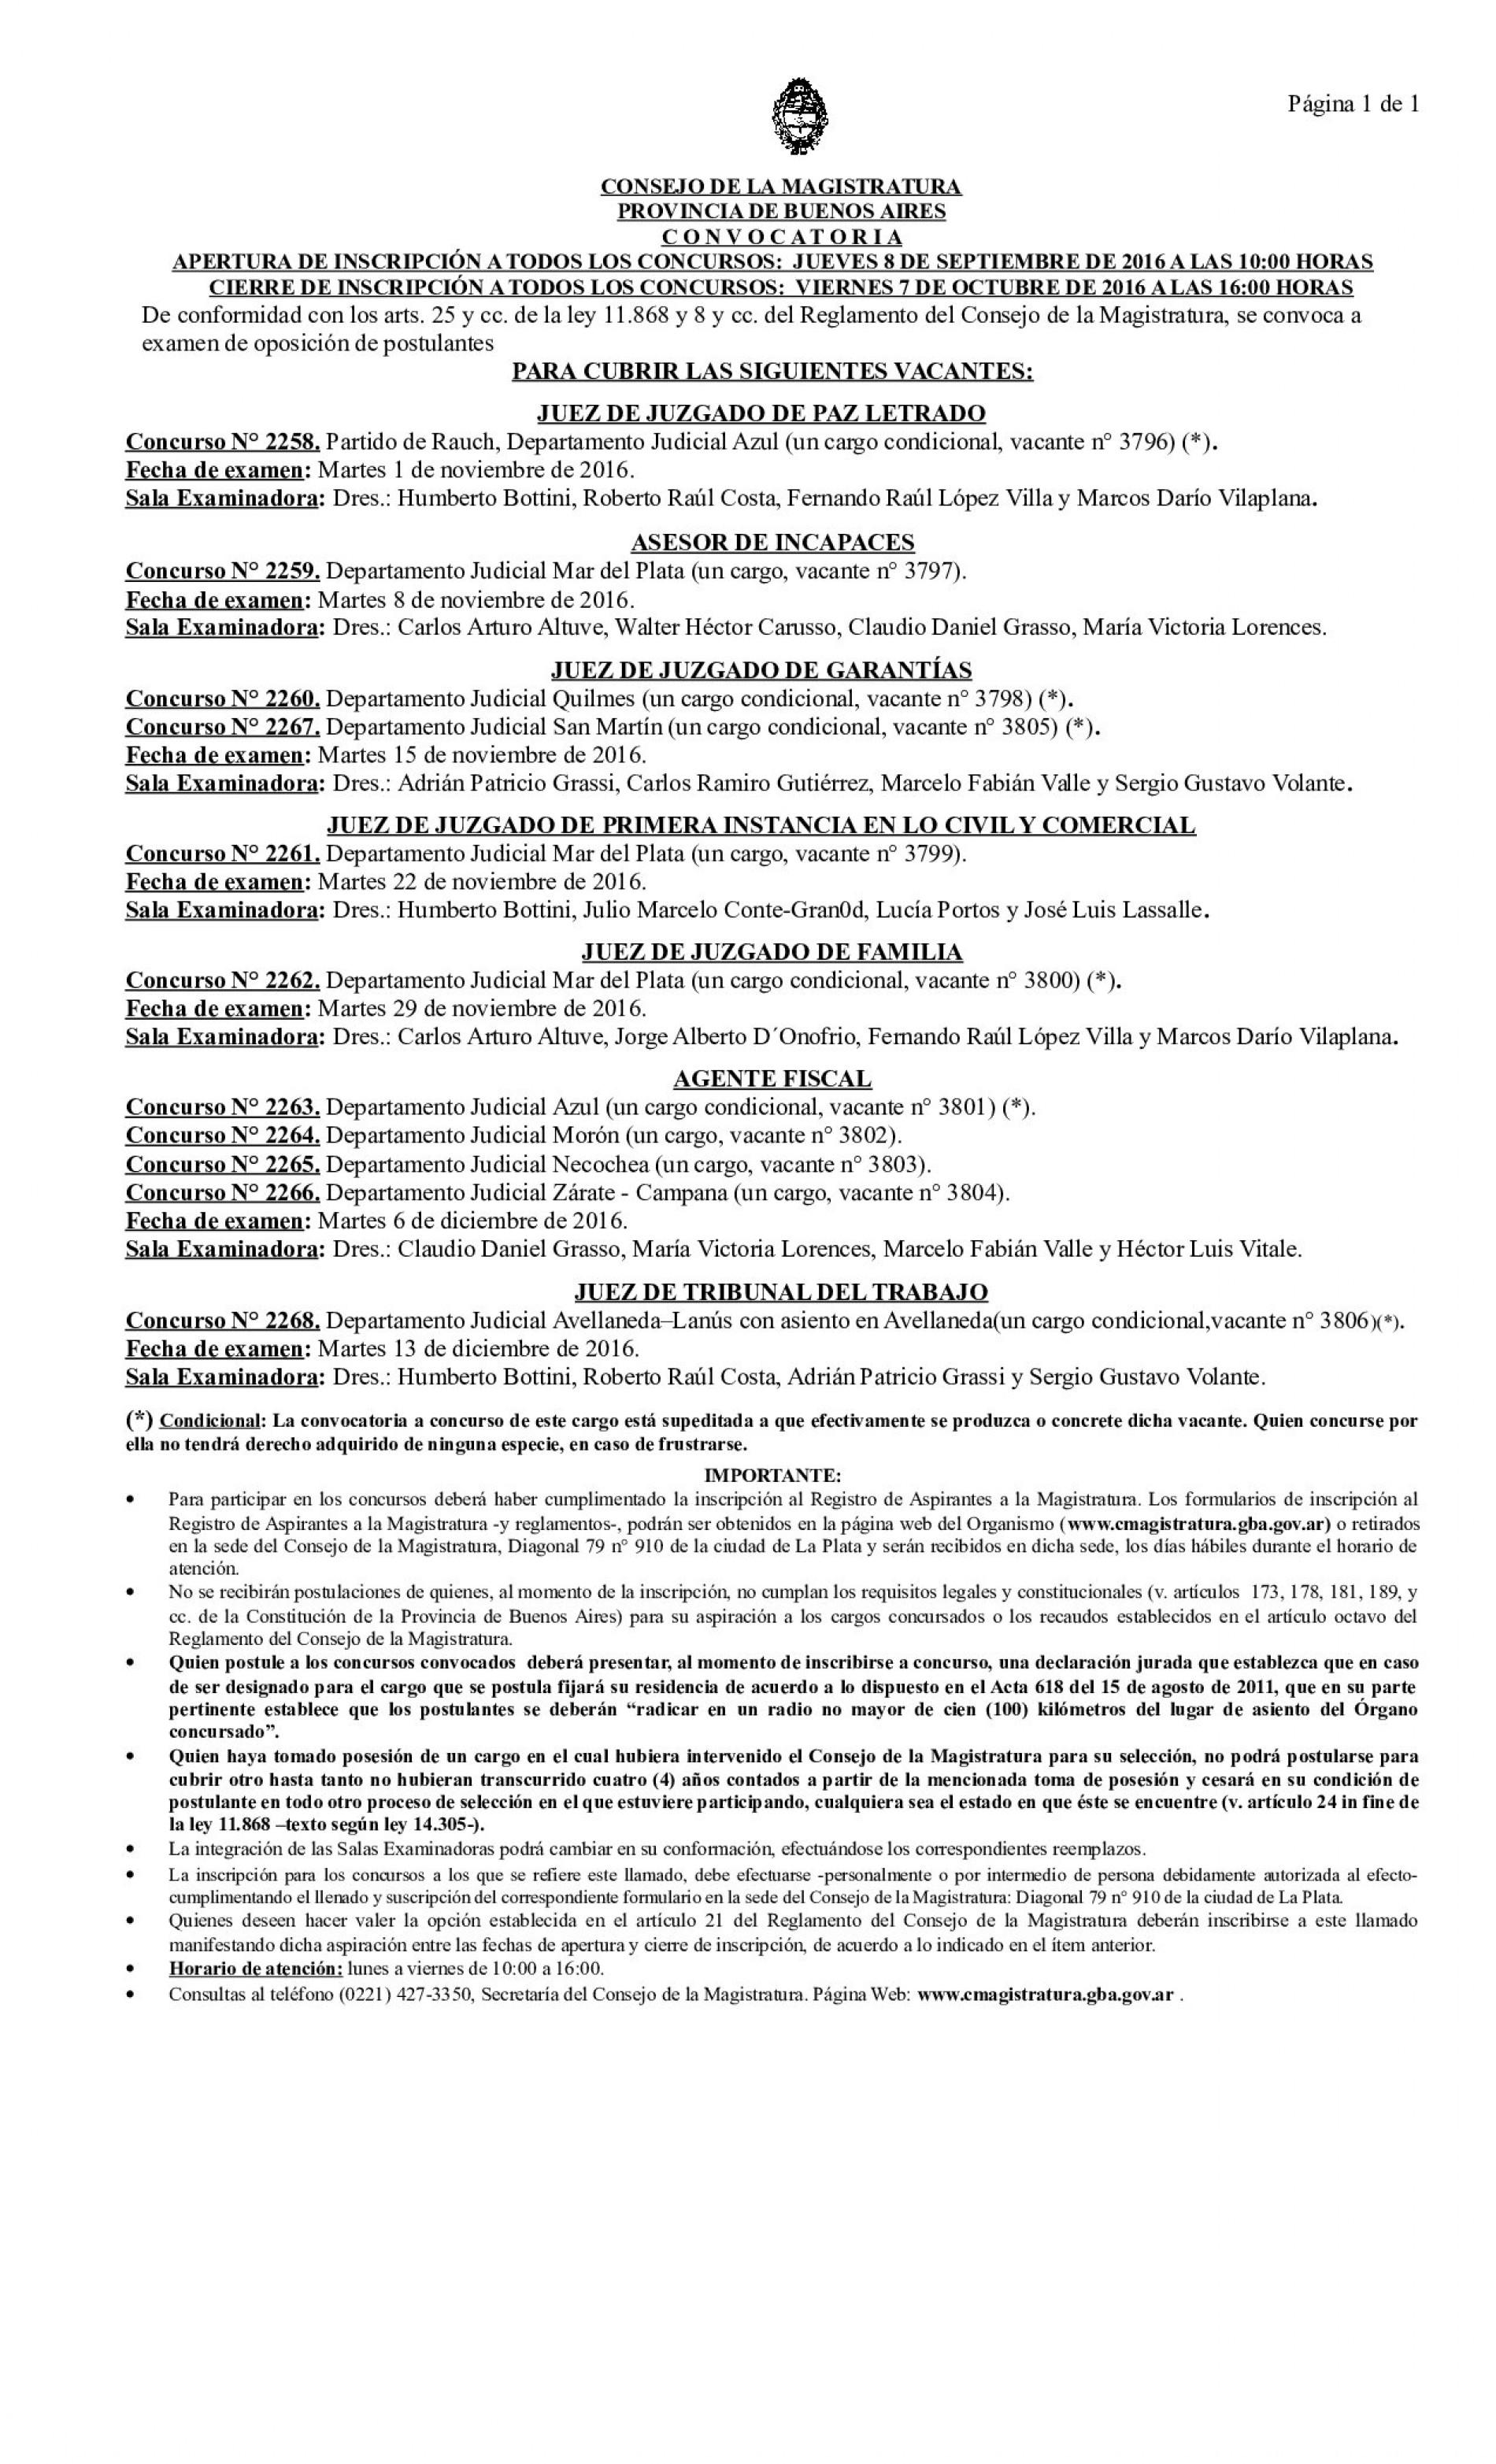 Consejo de la Magistratura de la Pcia.de Bs. As. Convocatoria